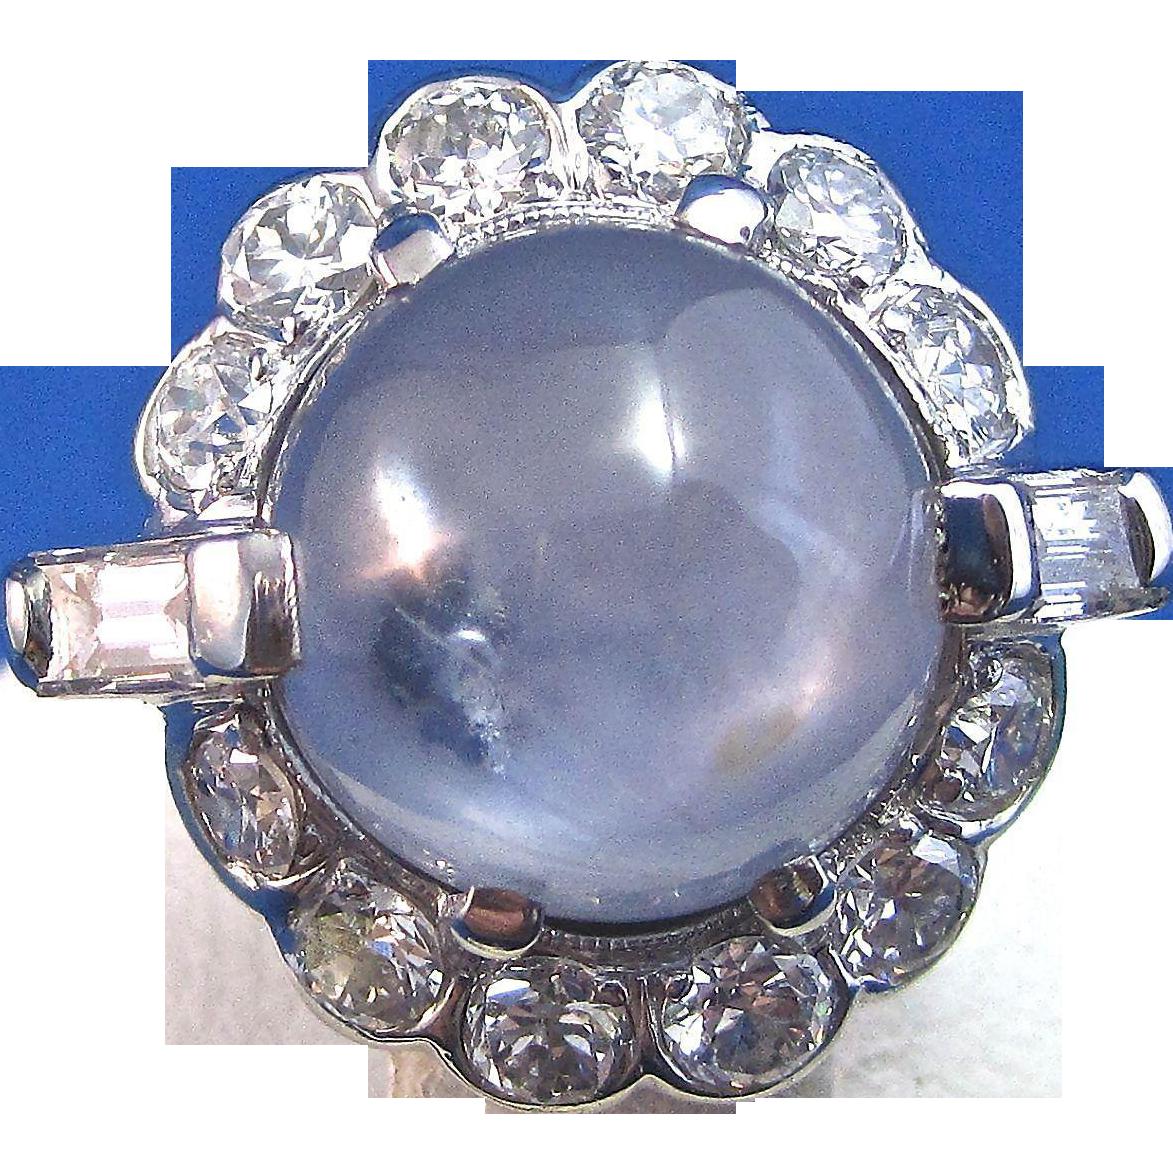 Vintage Estate 1950's Star Sapphire Engagement Wedding Birthstone Diamond Halo Ring Palladium